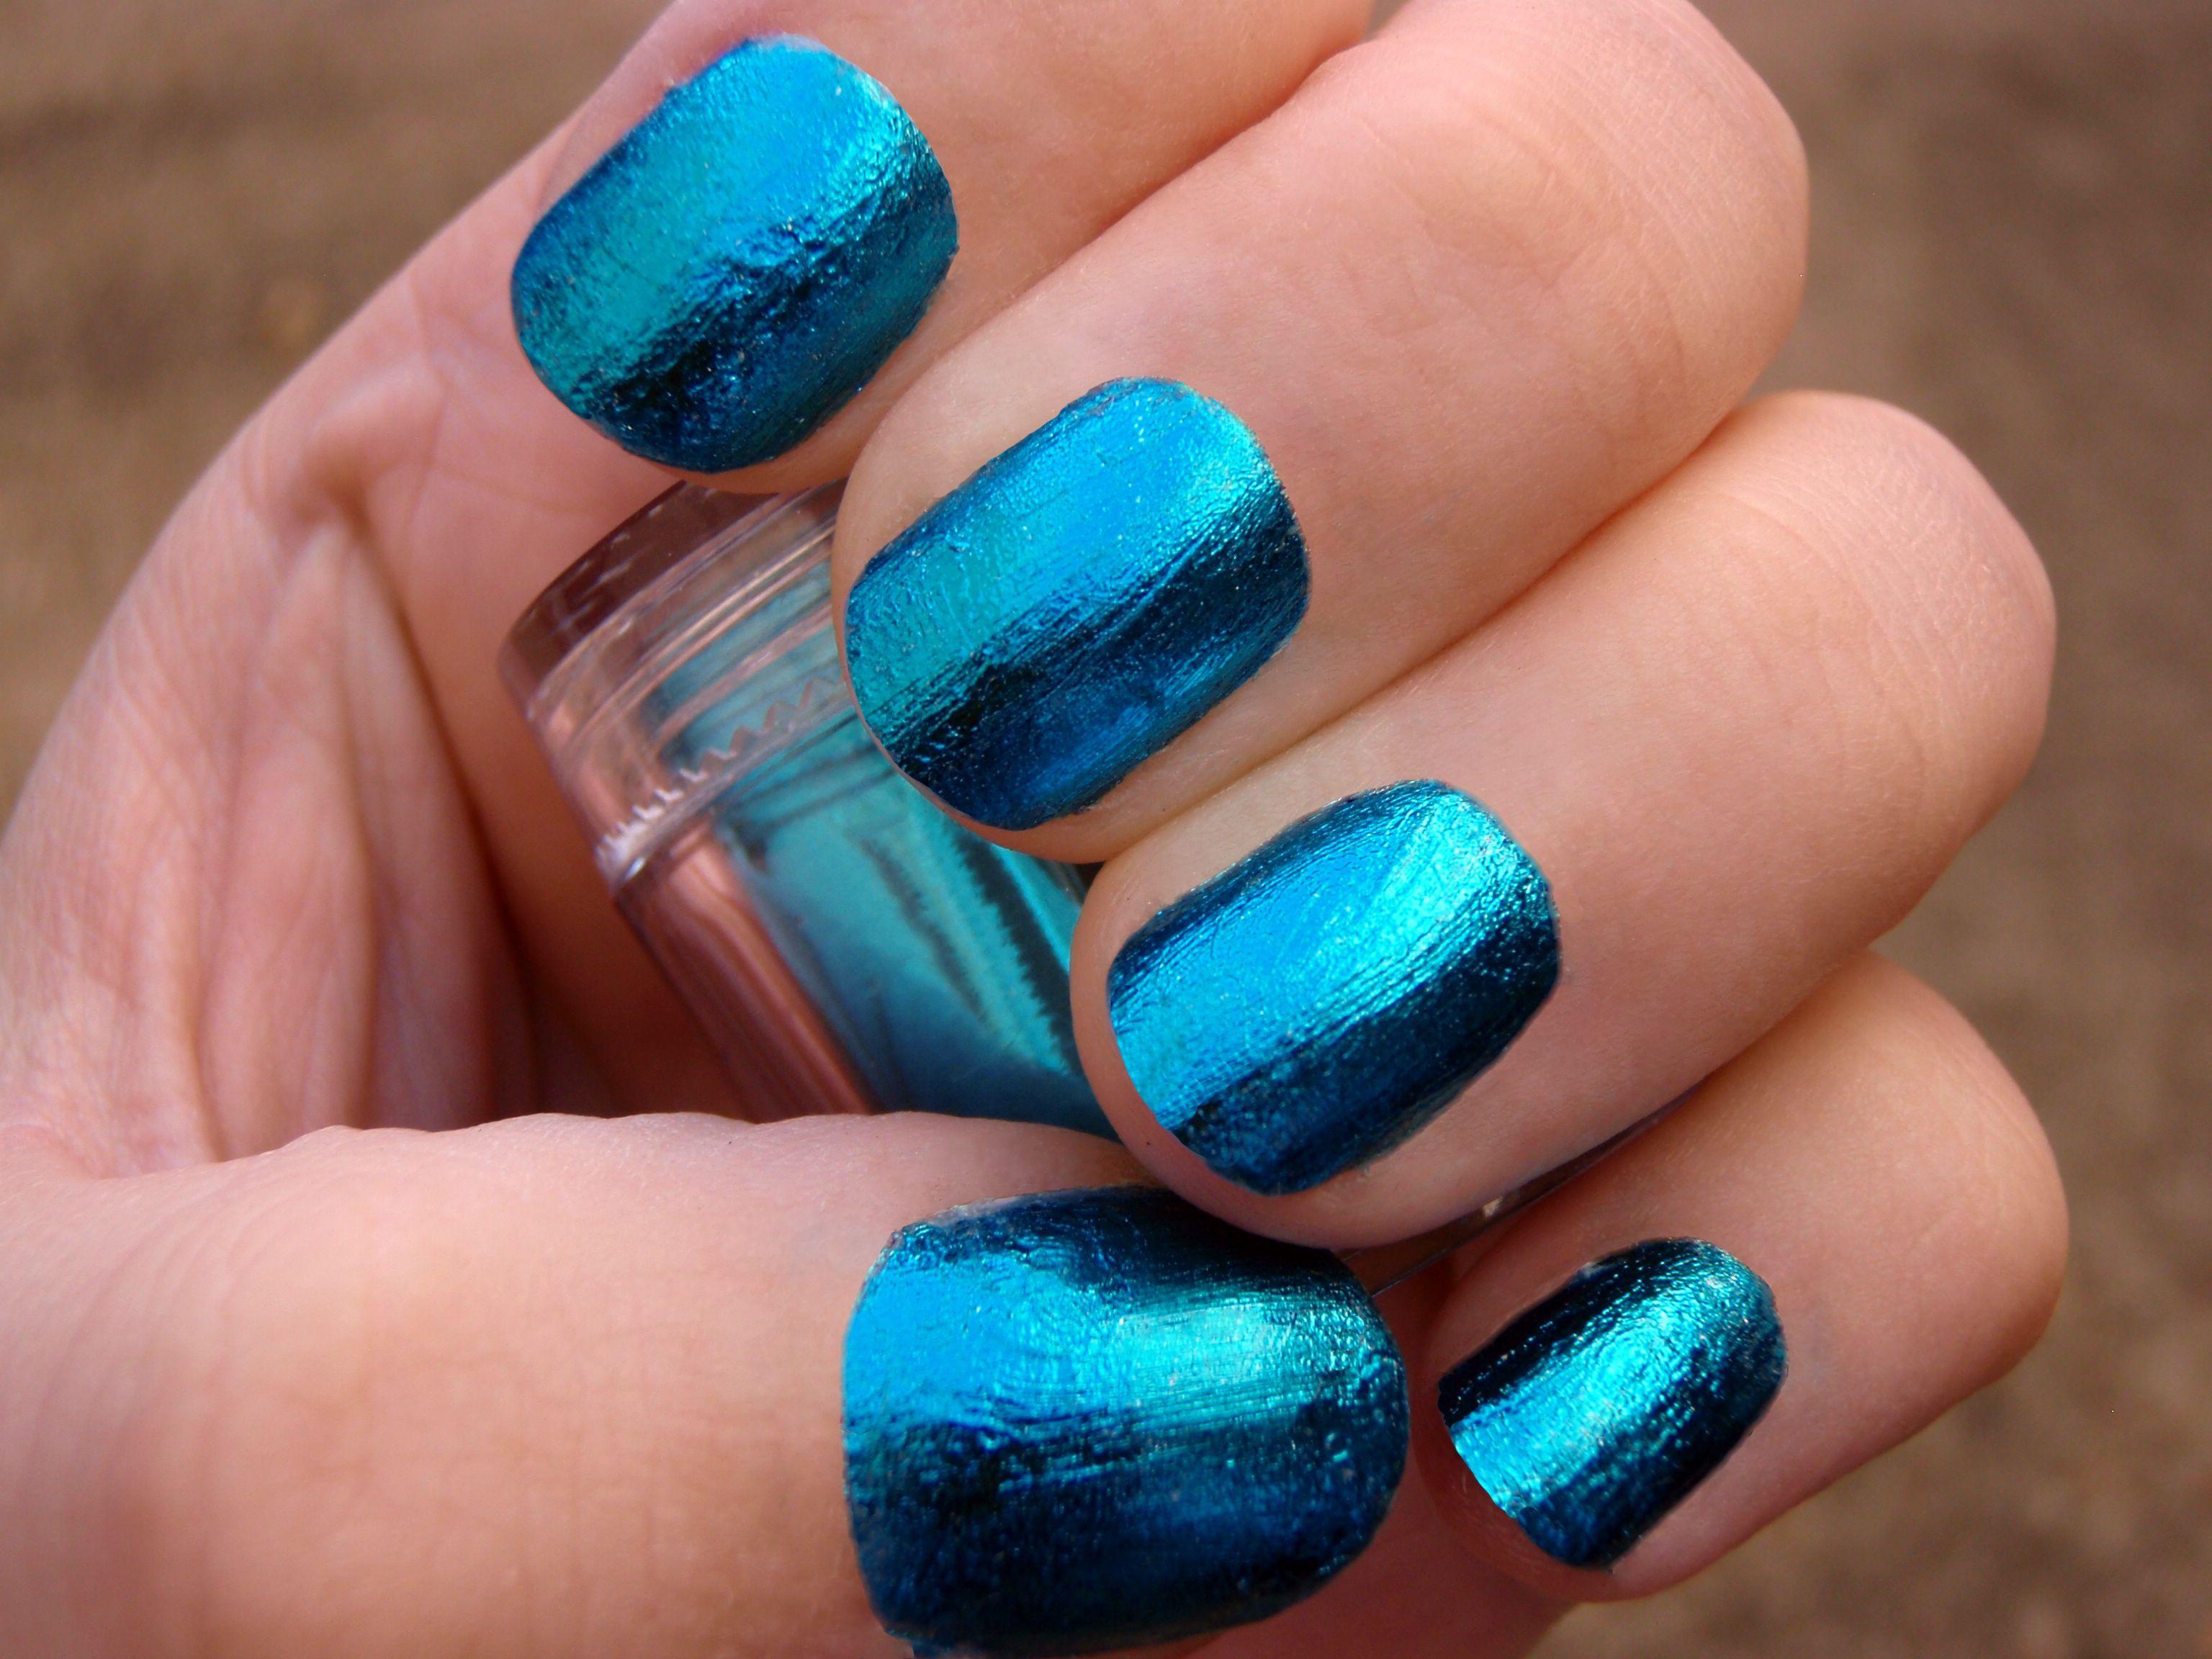 New Flow Nail Decorations nail foils in blue! | Nail Art | Pinterest ...